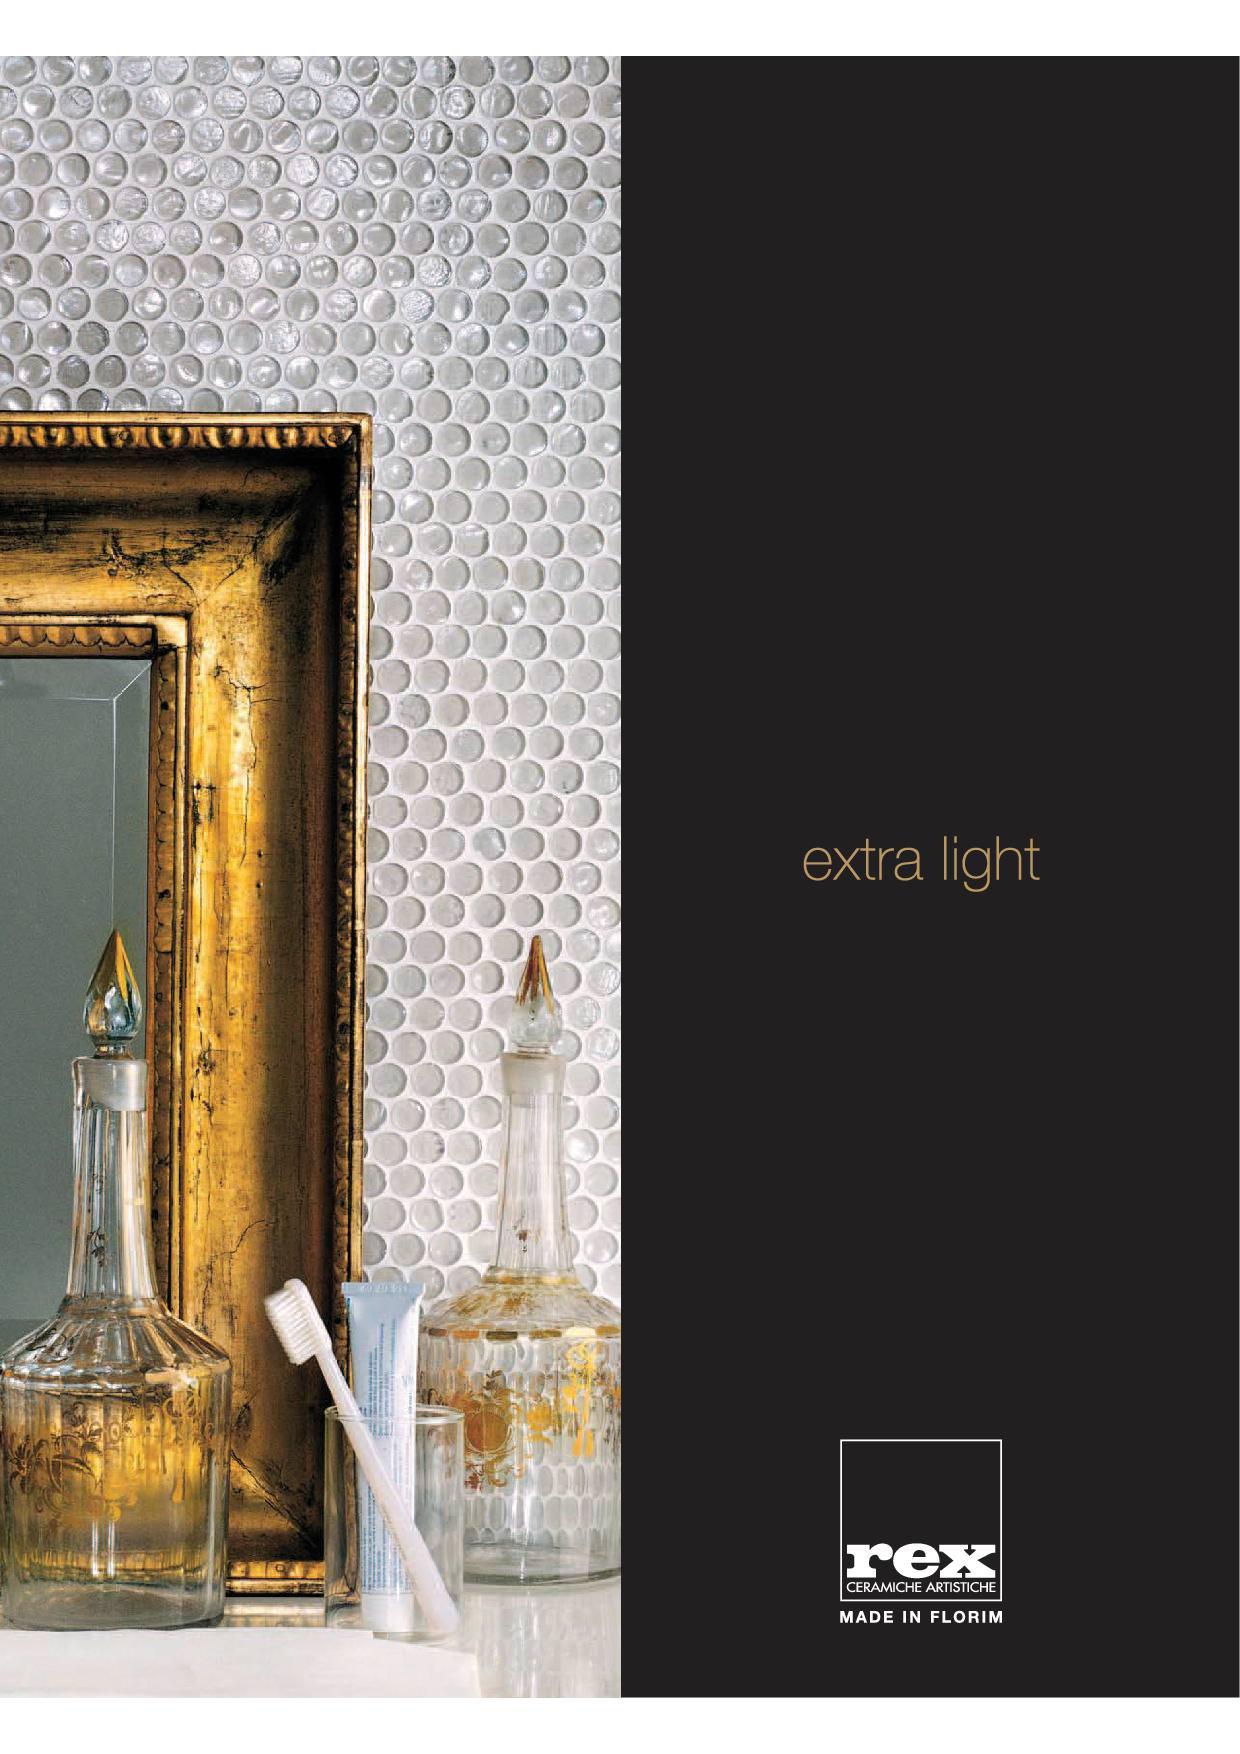 REX EXTRA LIGHT